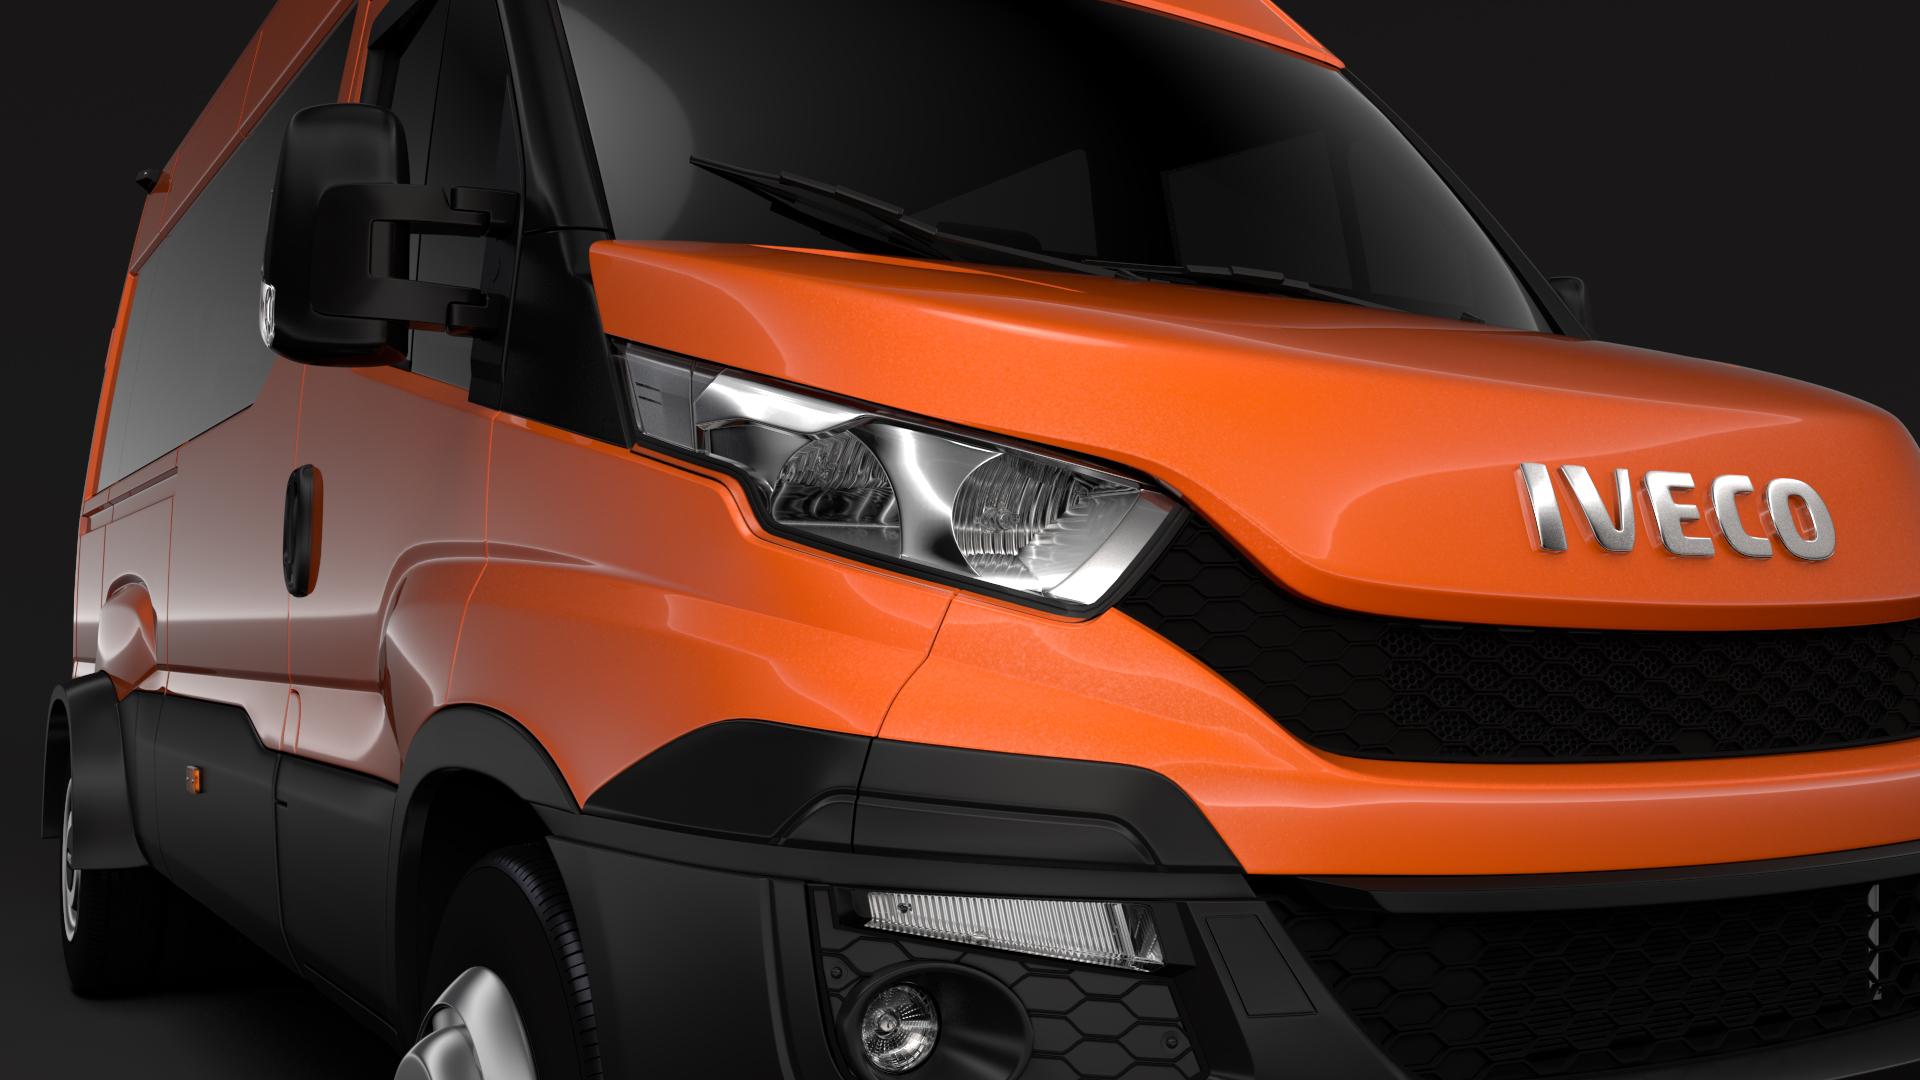 iveco daily minibus l3h2 2014-2016 3d model max fbx c4d lwo ma mb hrc xsi obj 276039